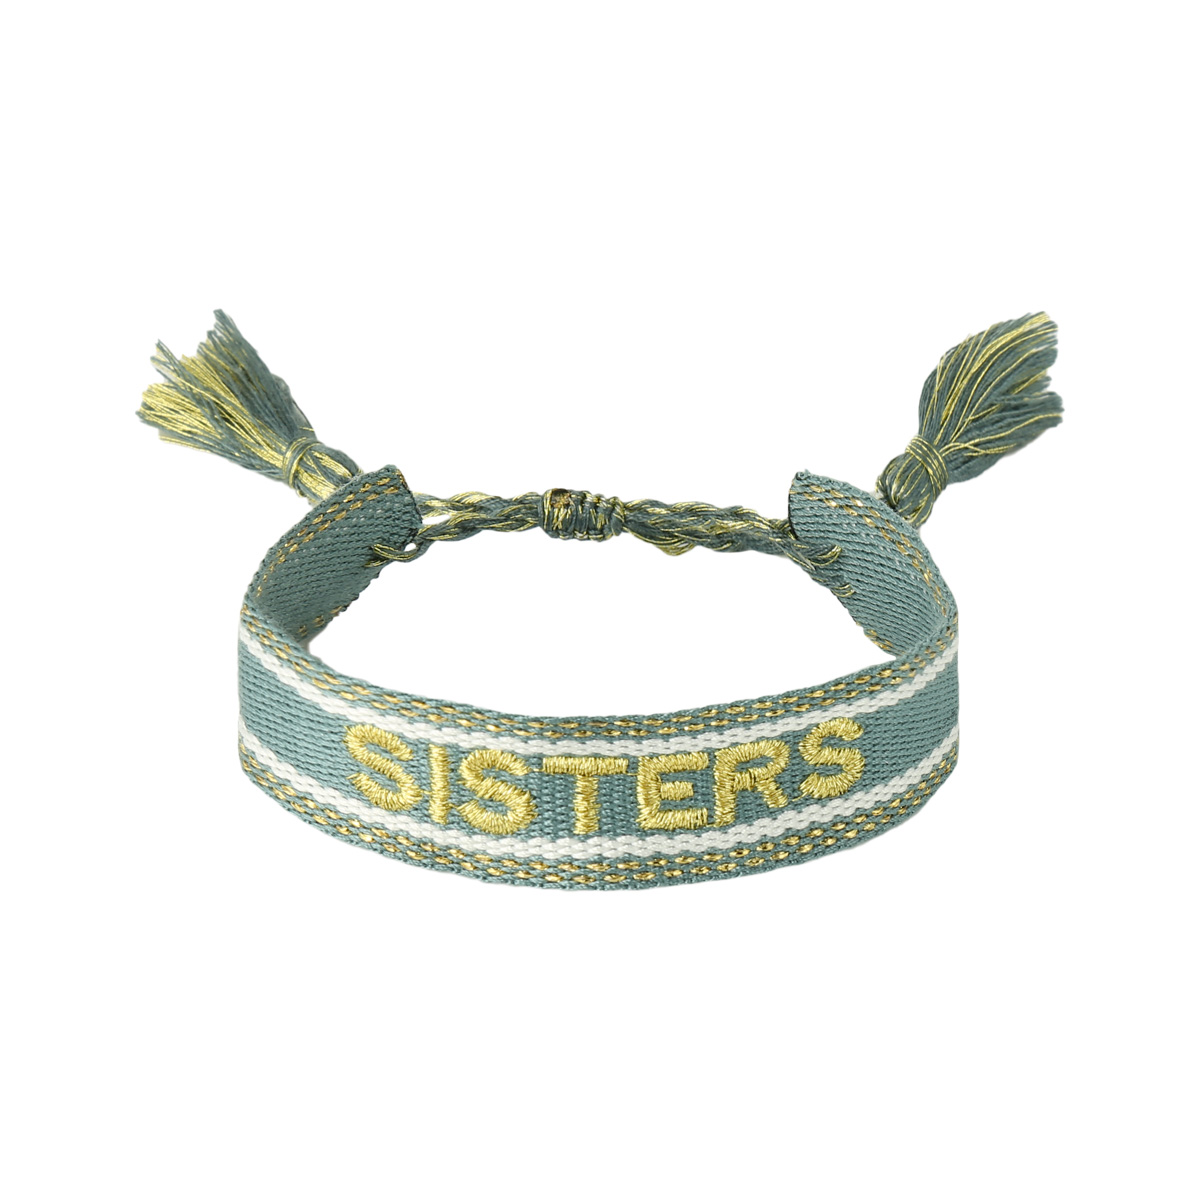 Bracelet Woven Sisters